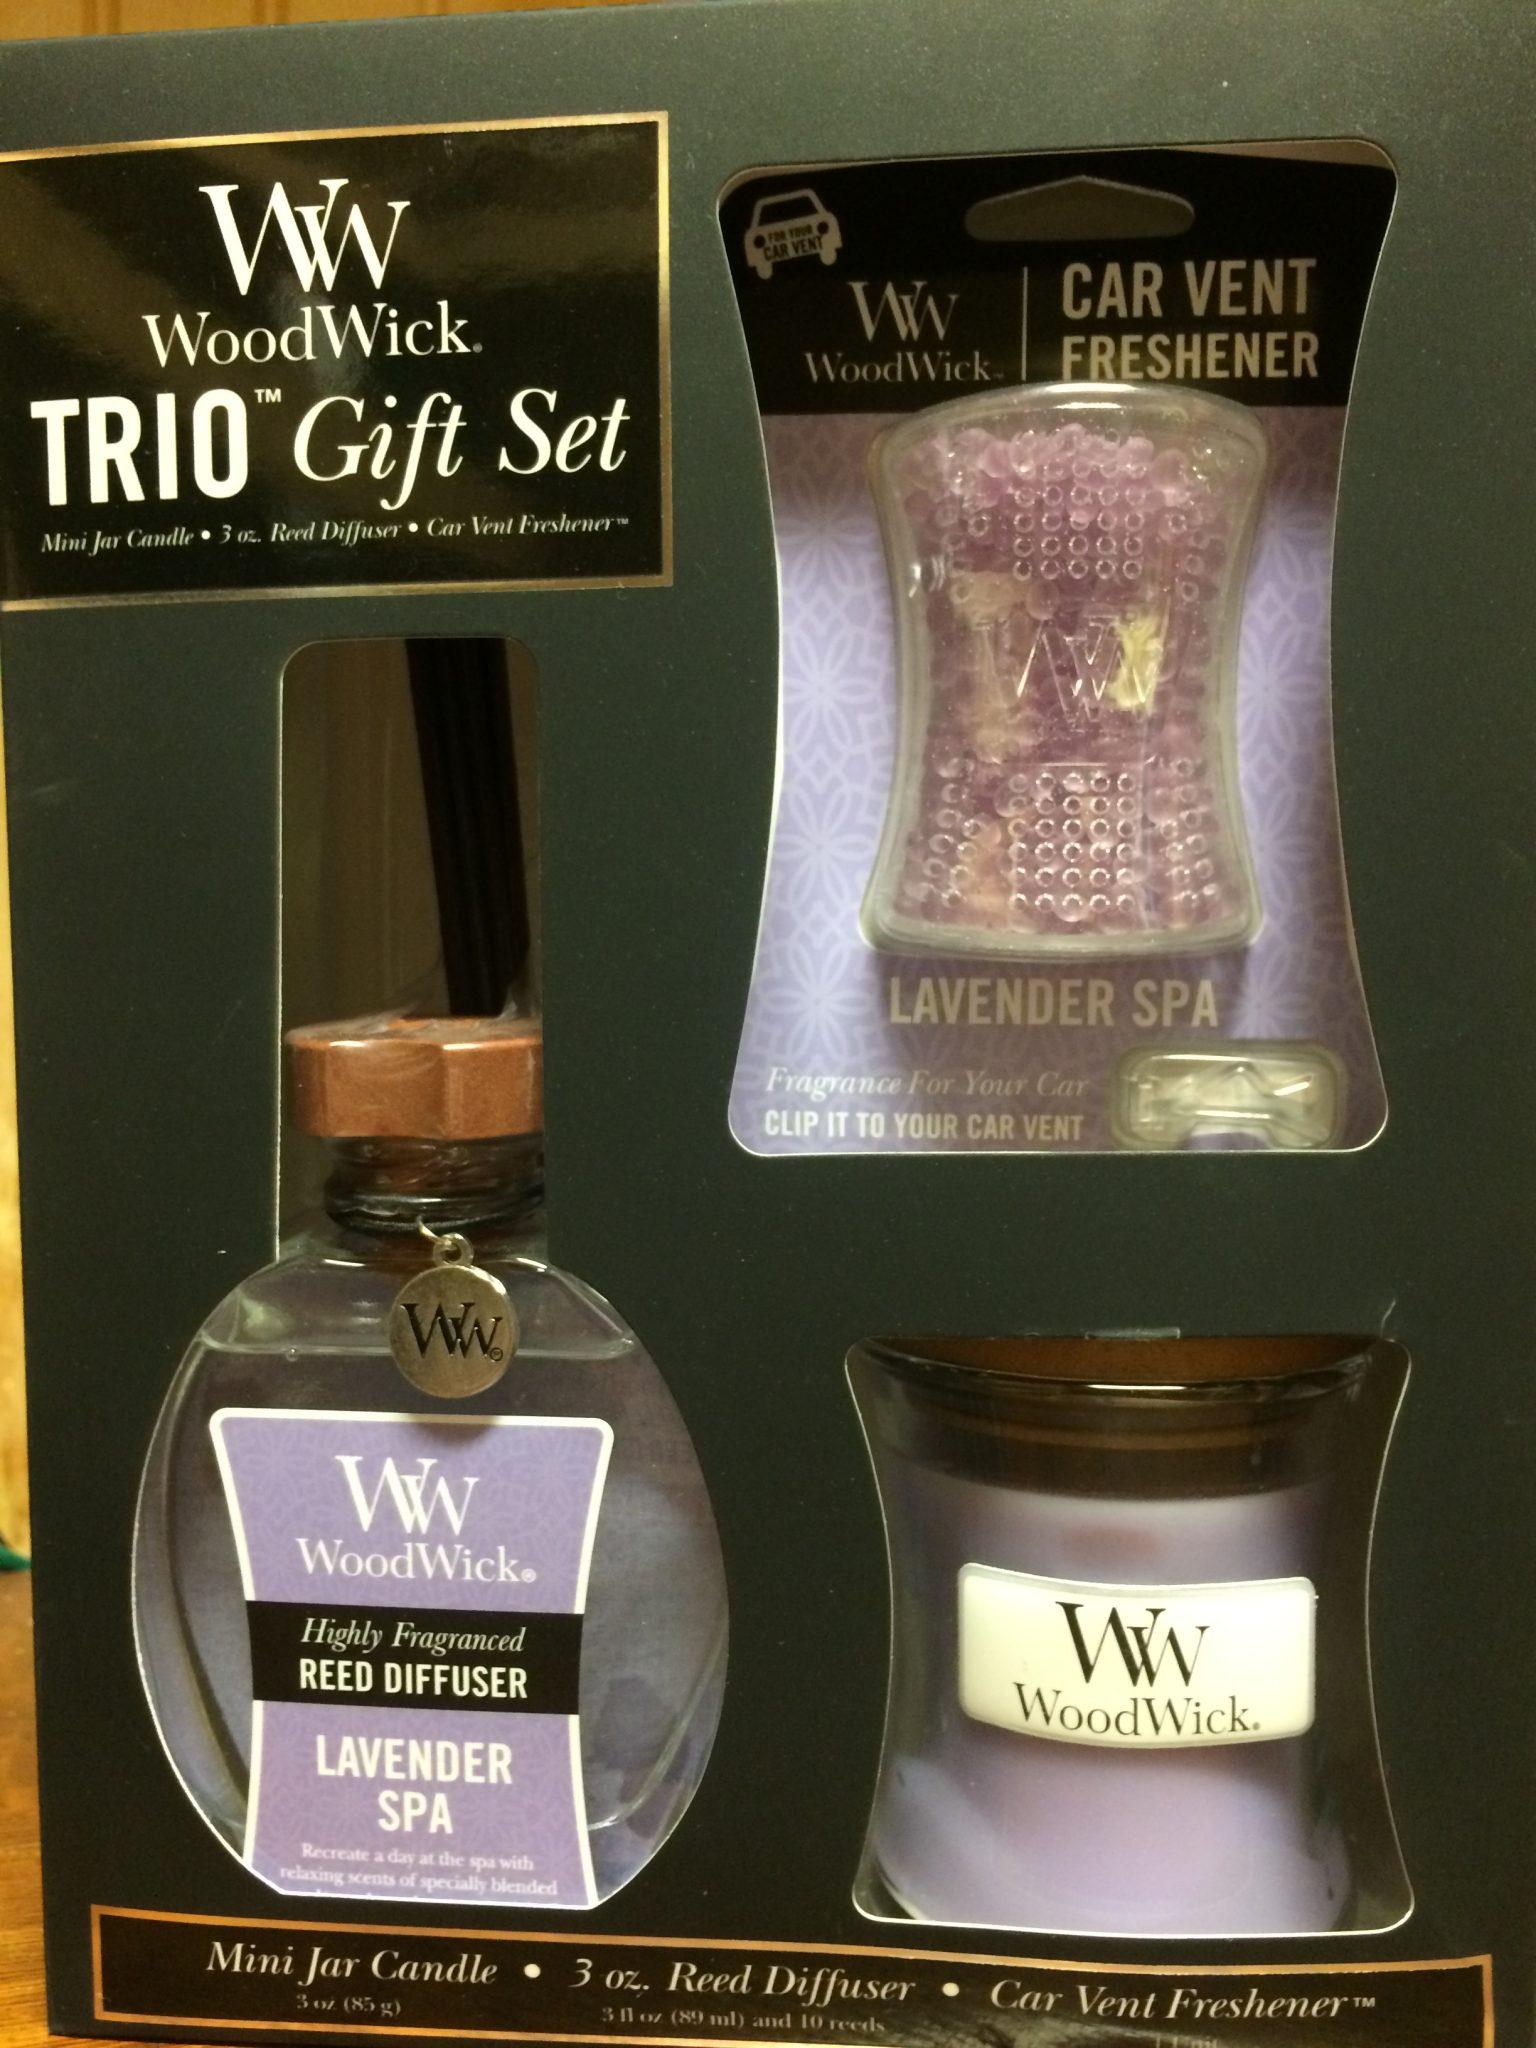 woodwick trio gift set